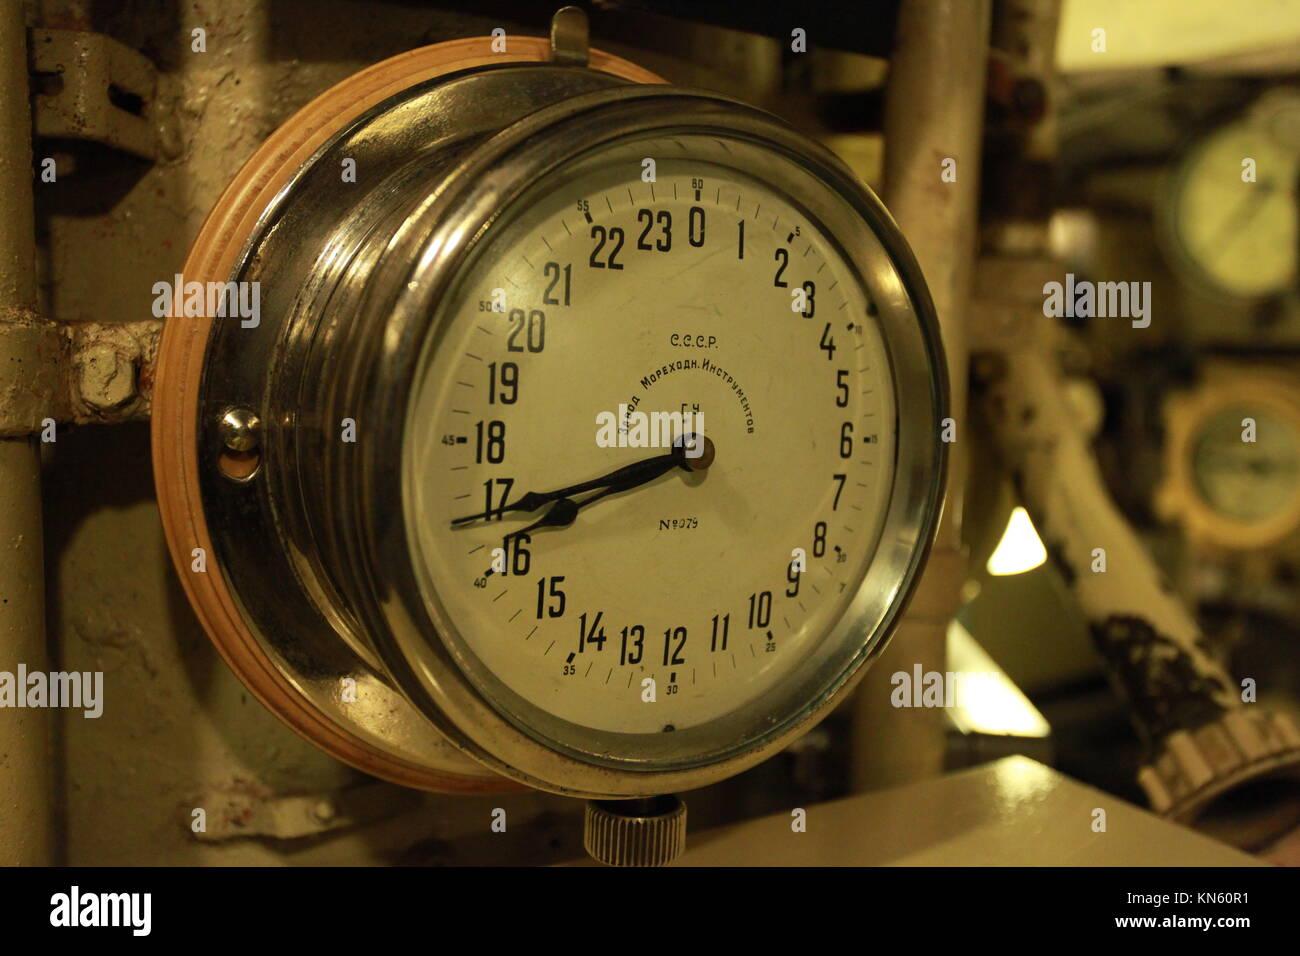 Marine chronometer on board of the submarine - Stock Image